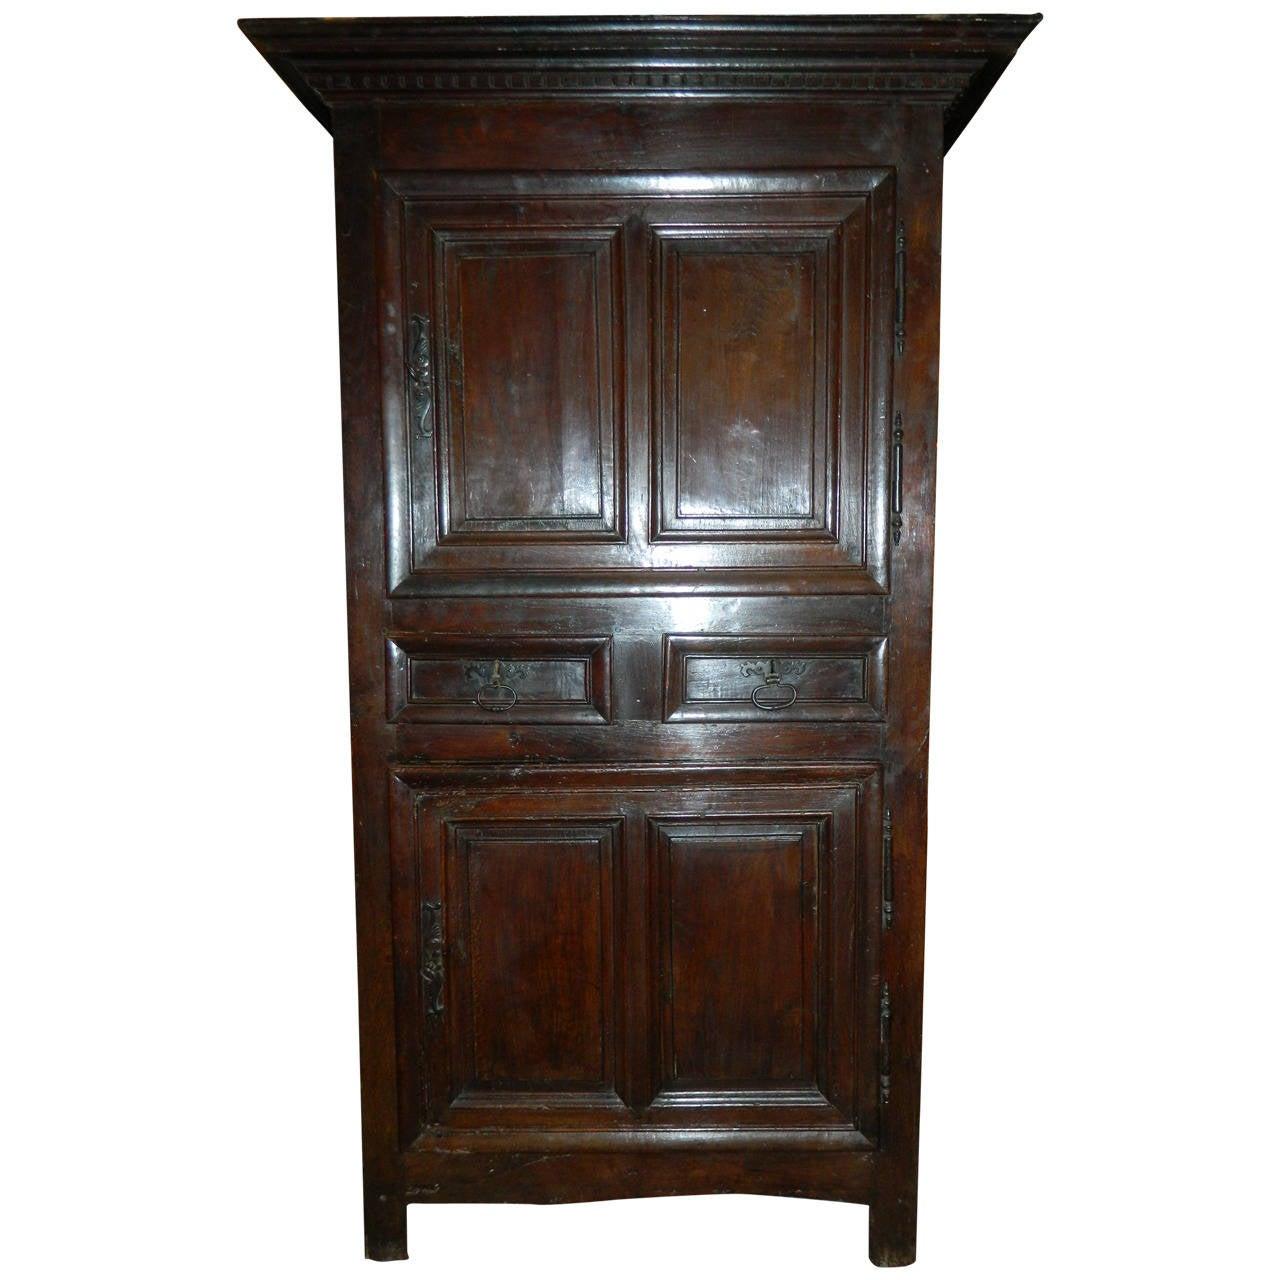 French Oak Cabinet or Bonnetiere, 18th Century